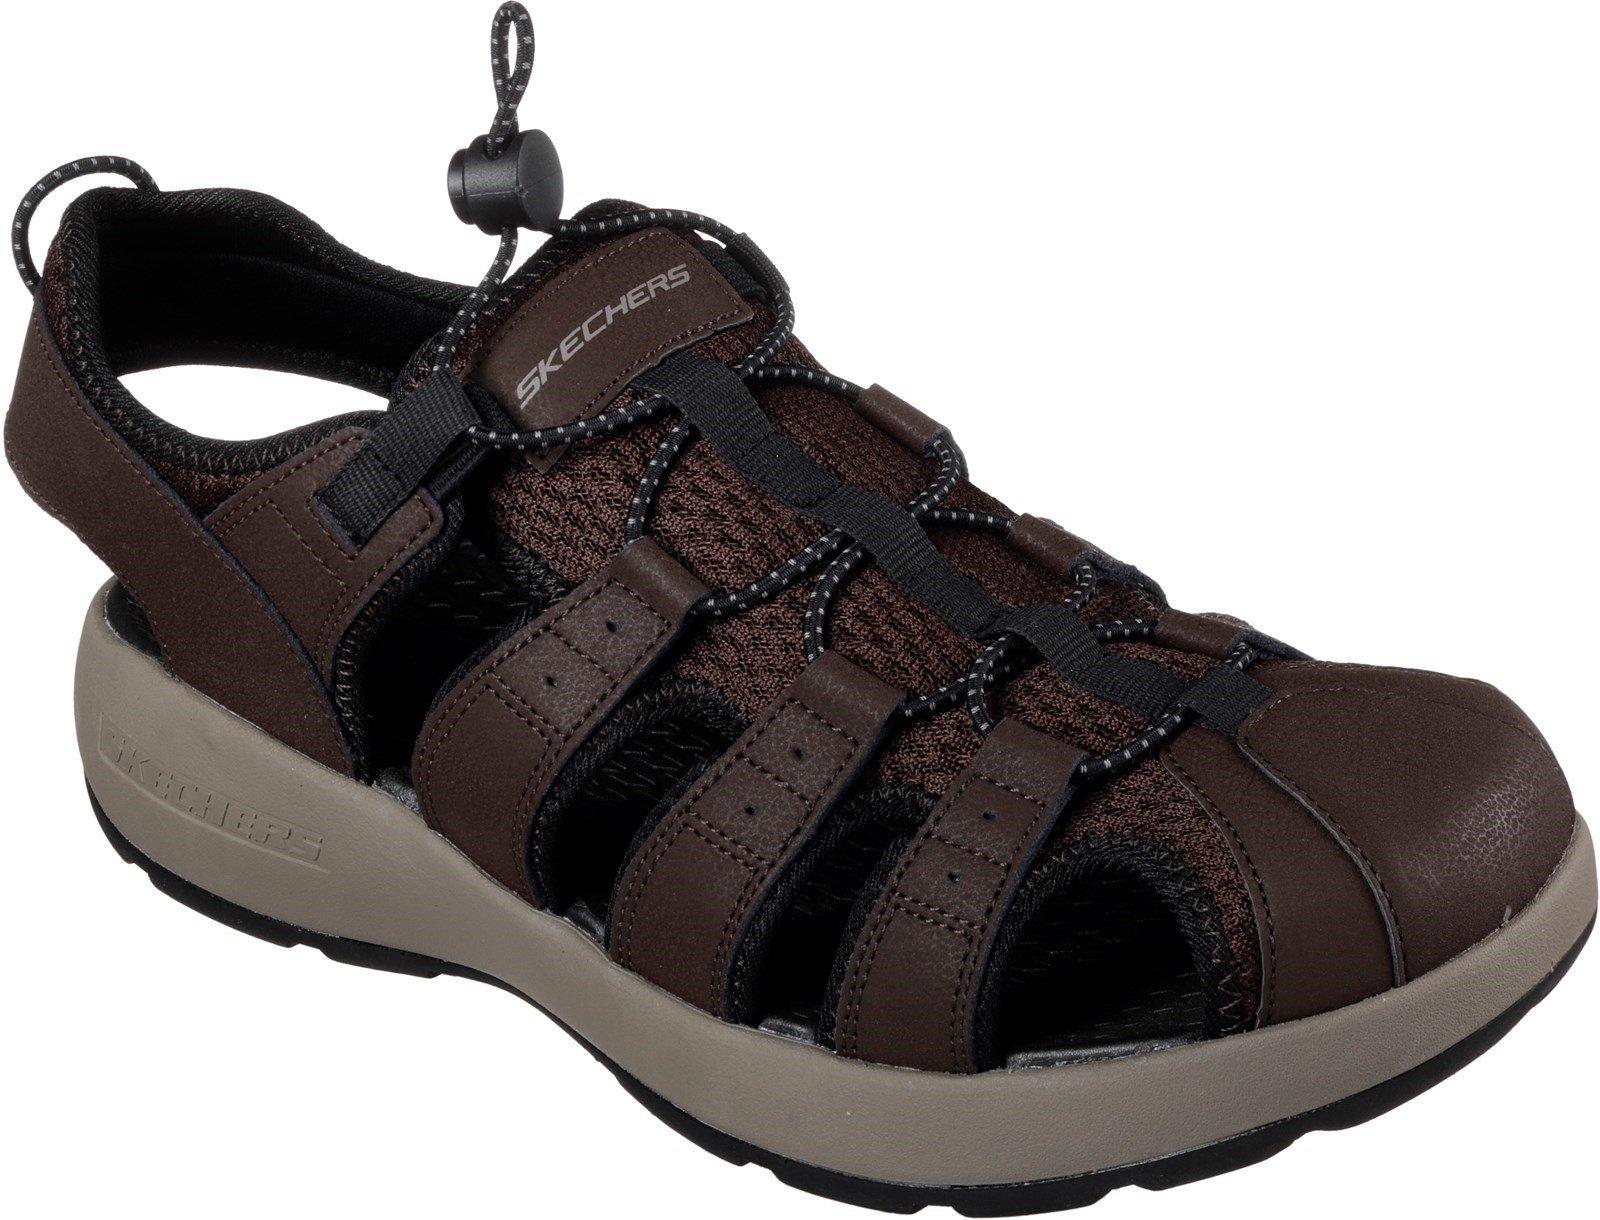 Skechers Men's Melbo Journeyman 2 Summer Sandal Brown 32212 - Brown 6